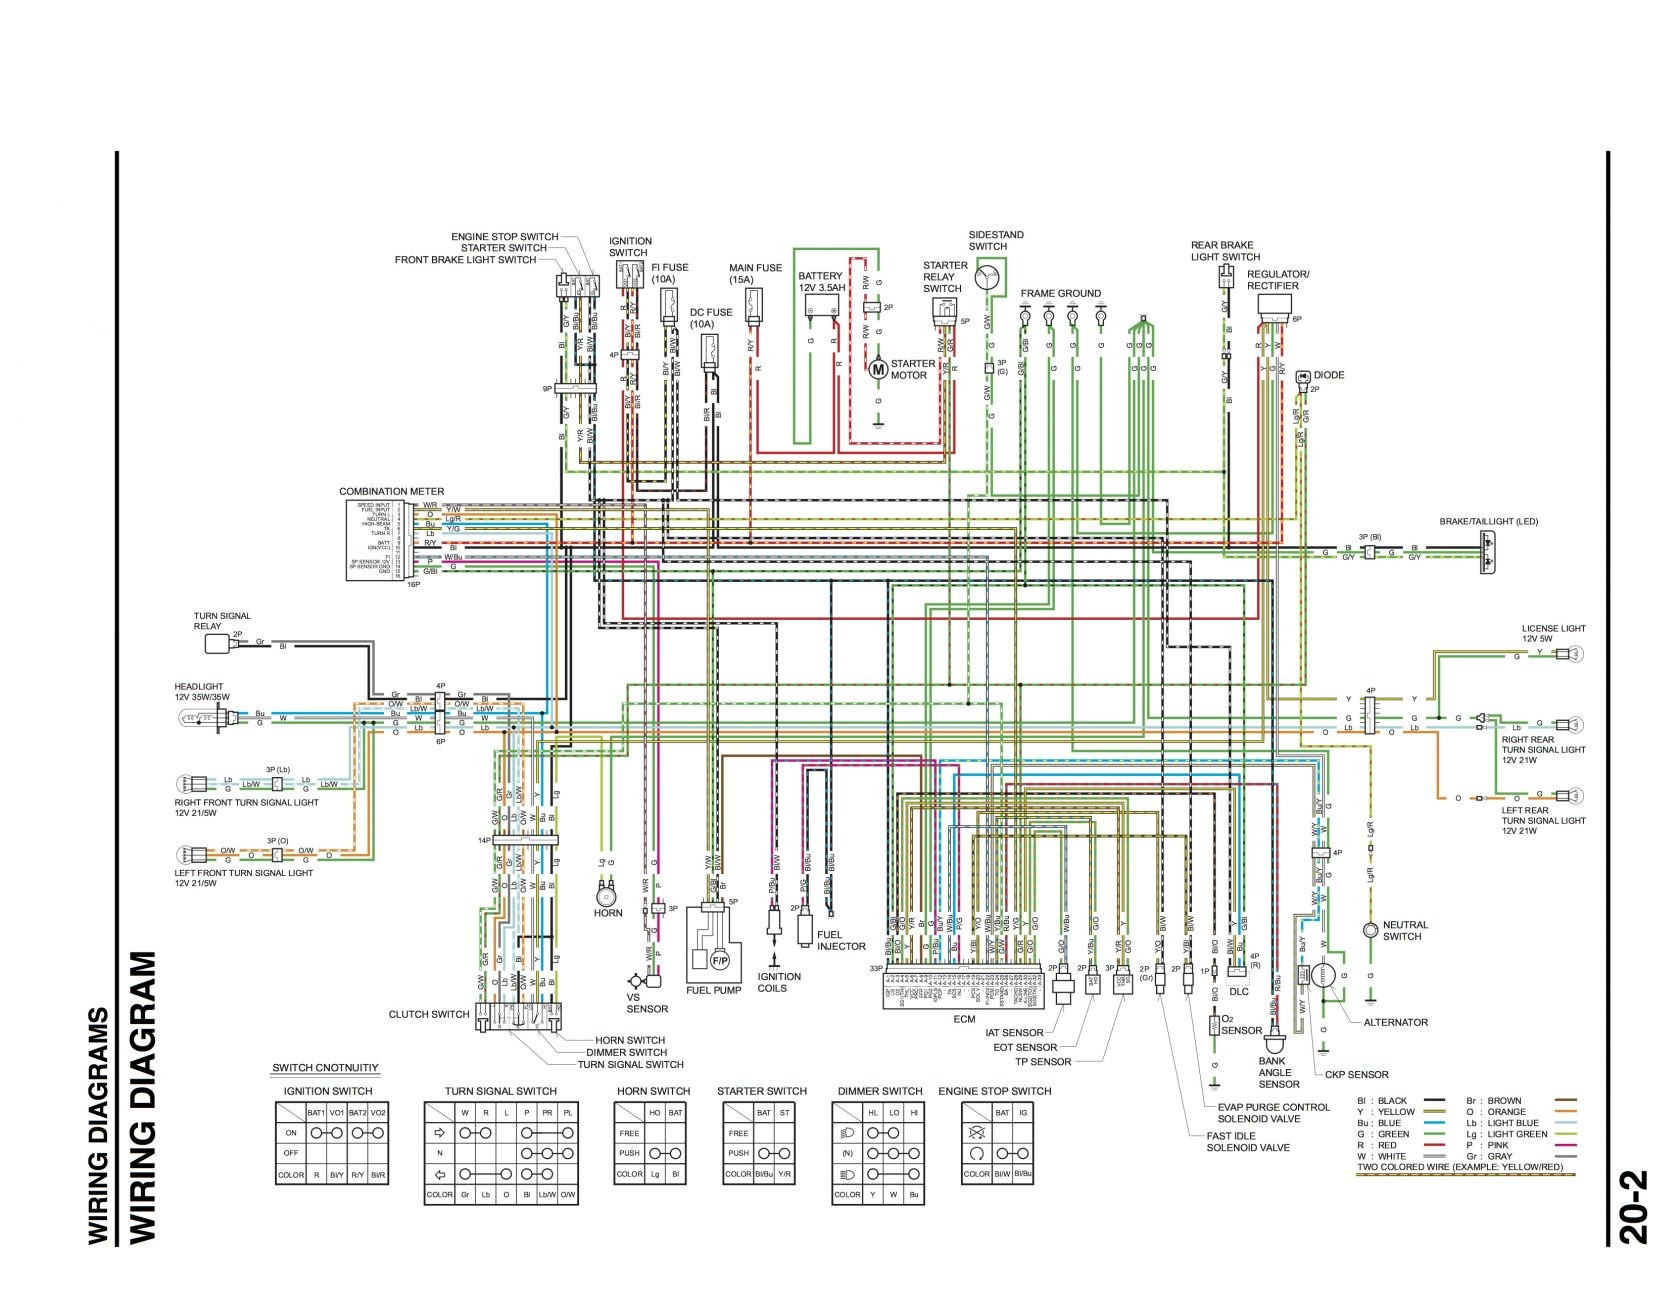 honda msx 125 wiring diagram get free image about wiring diagram rh moveleiros co 2002 Honda Odyssey Radio Wire Diagram Schematic Diagram Honda